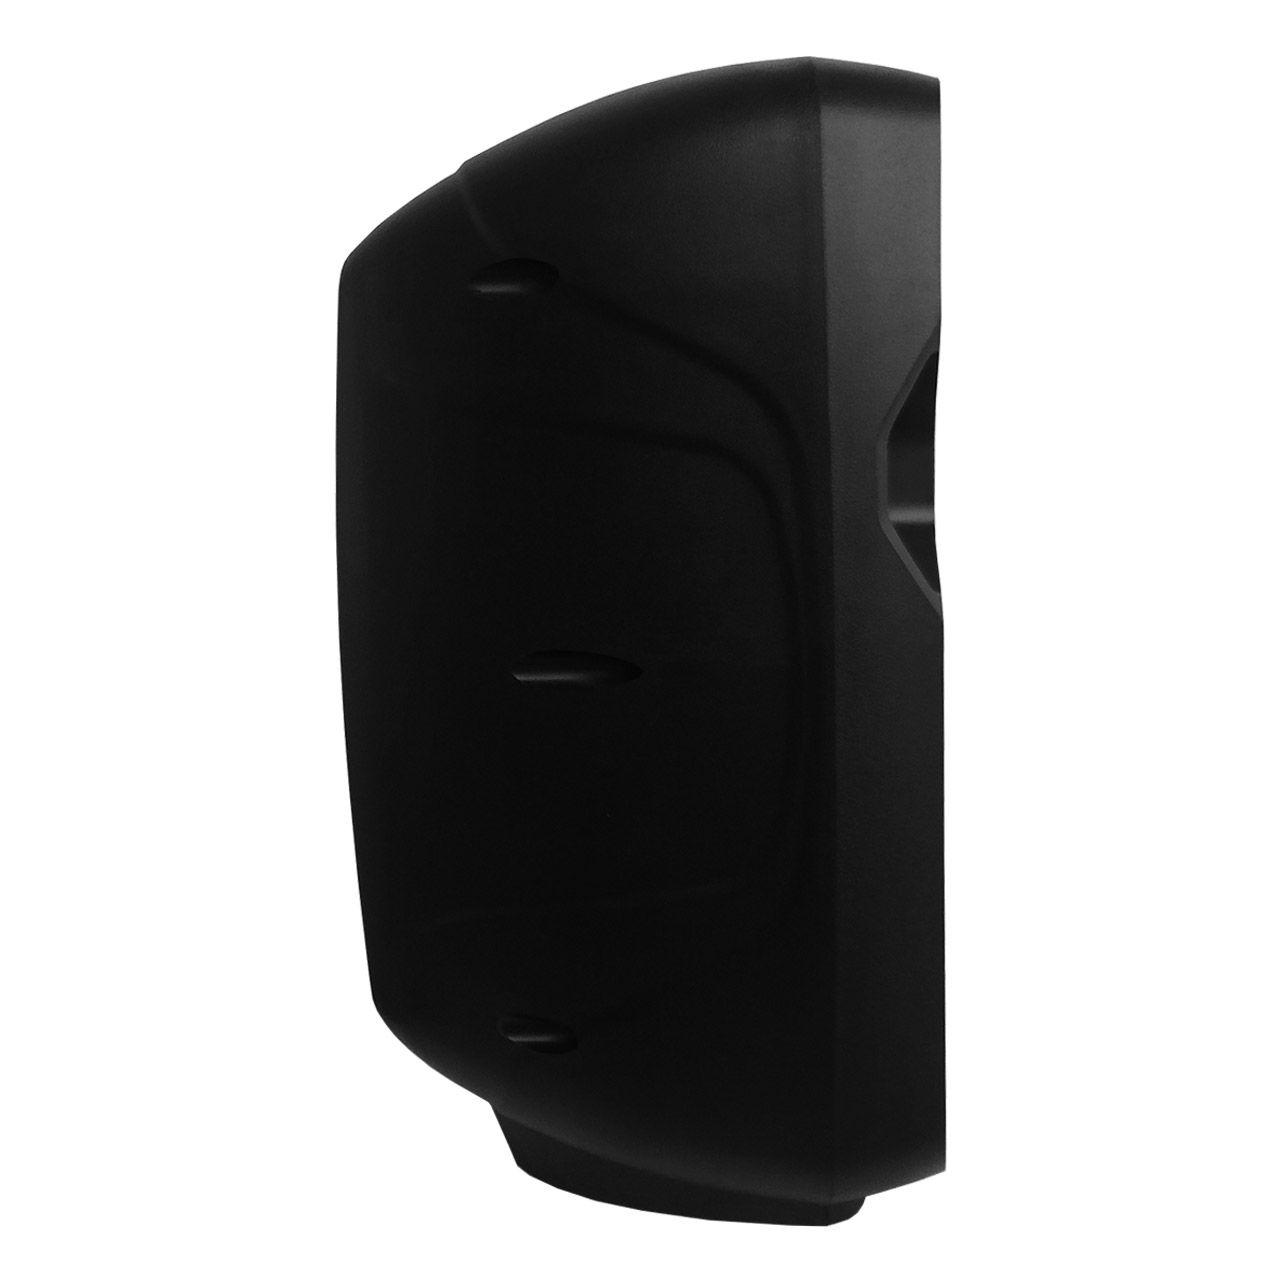 Caixa De Som Passiva Wls S10 100W Rms